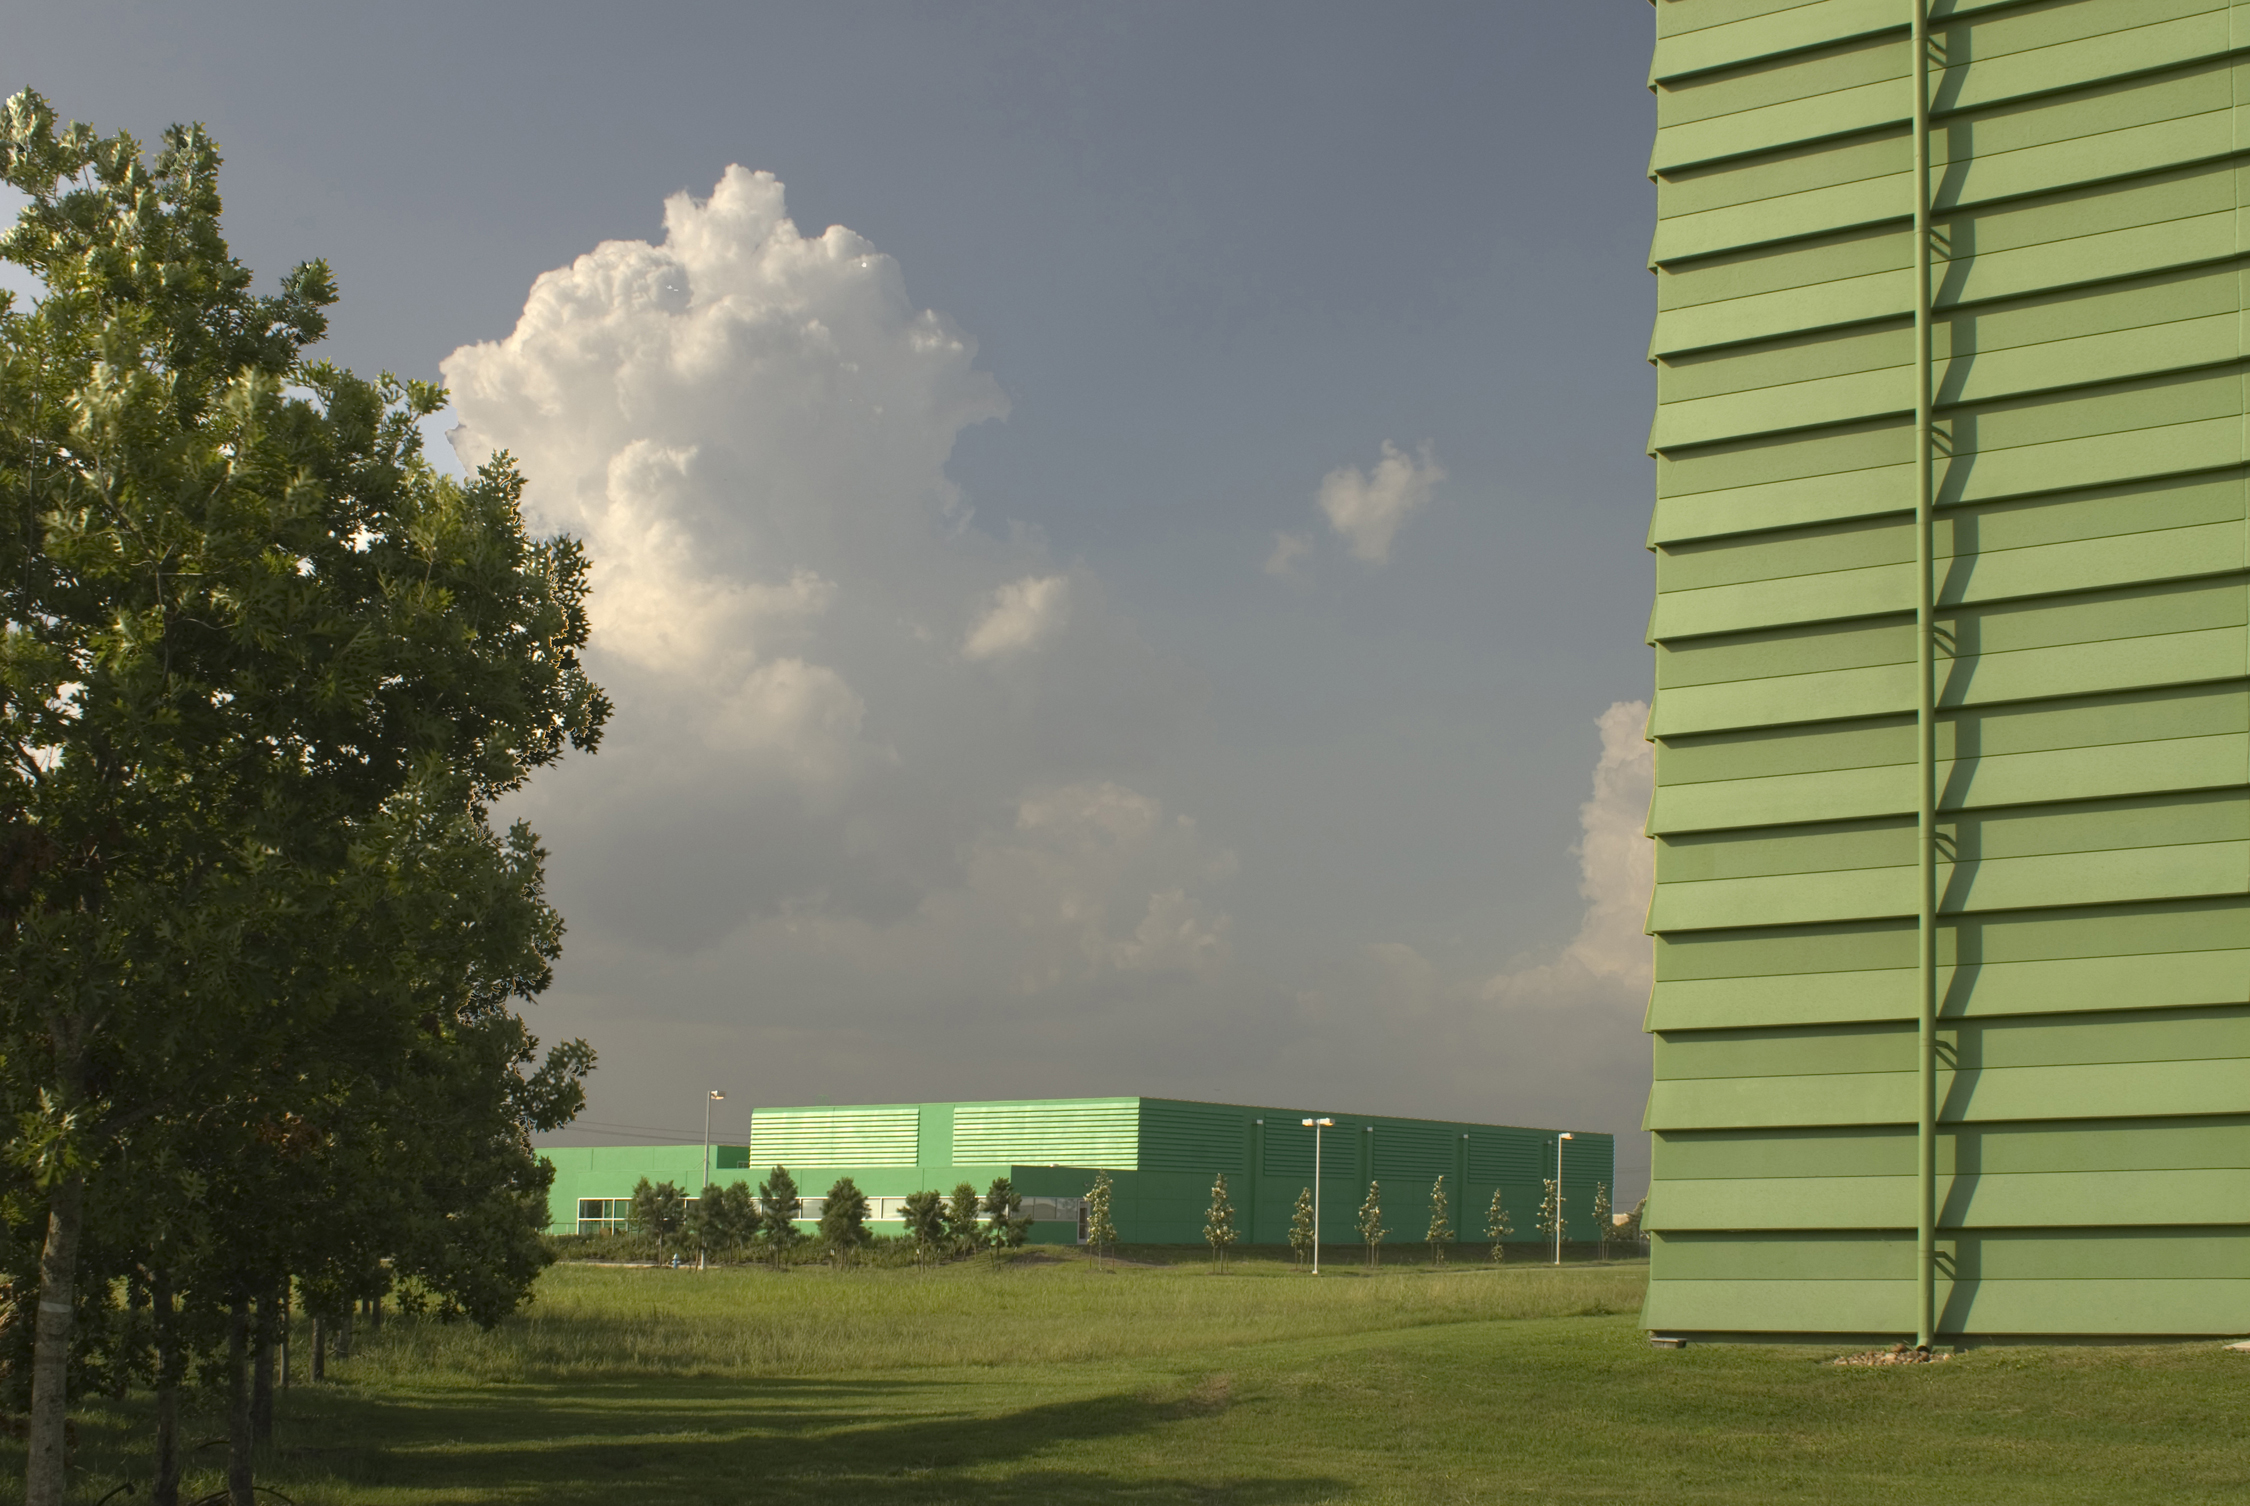 10_LSC_Rice South Annex_Hester 1.jpg